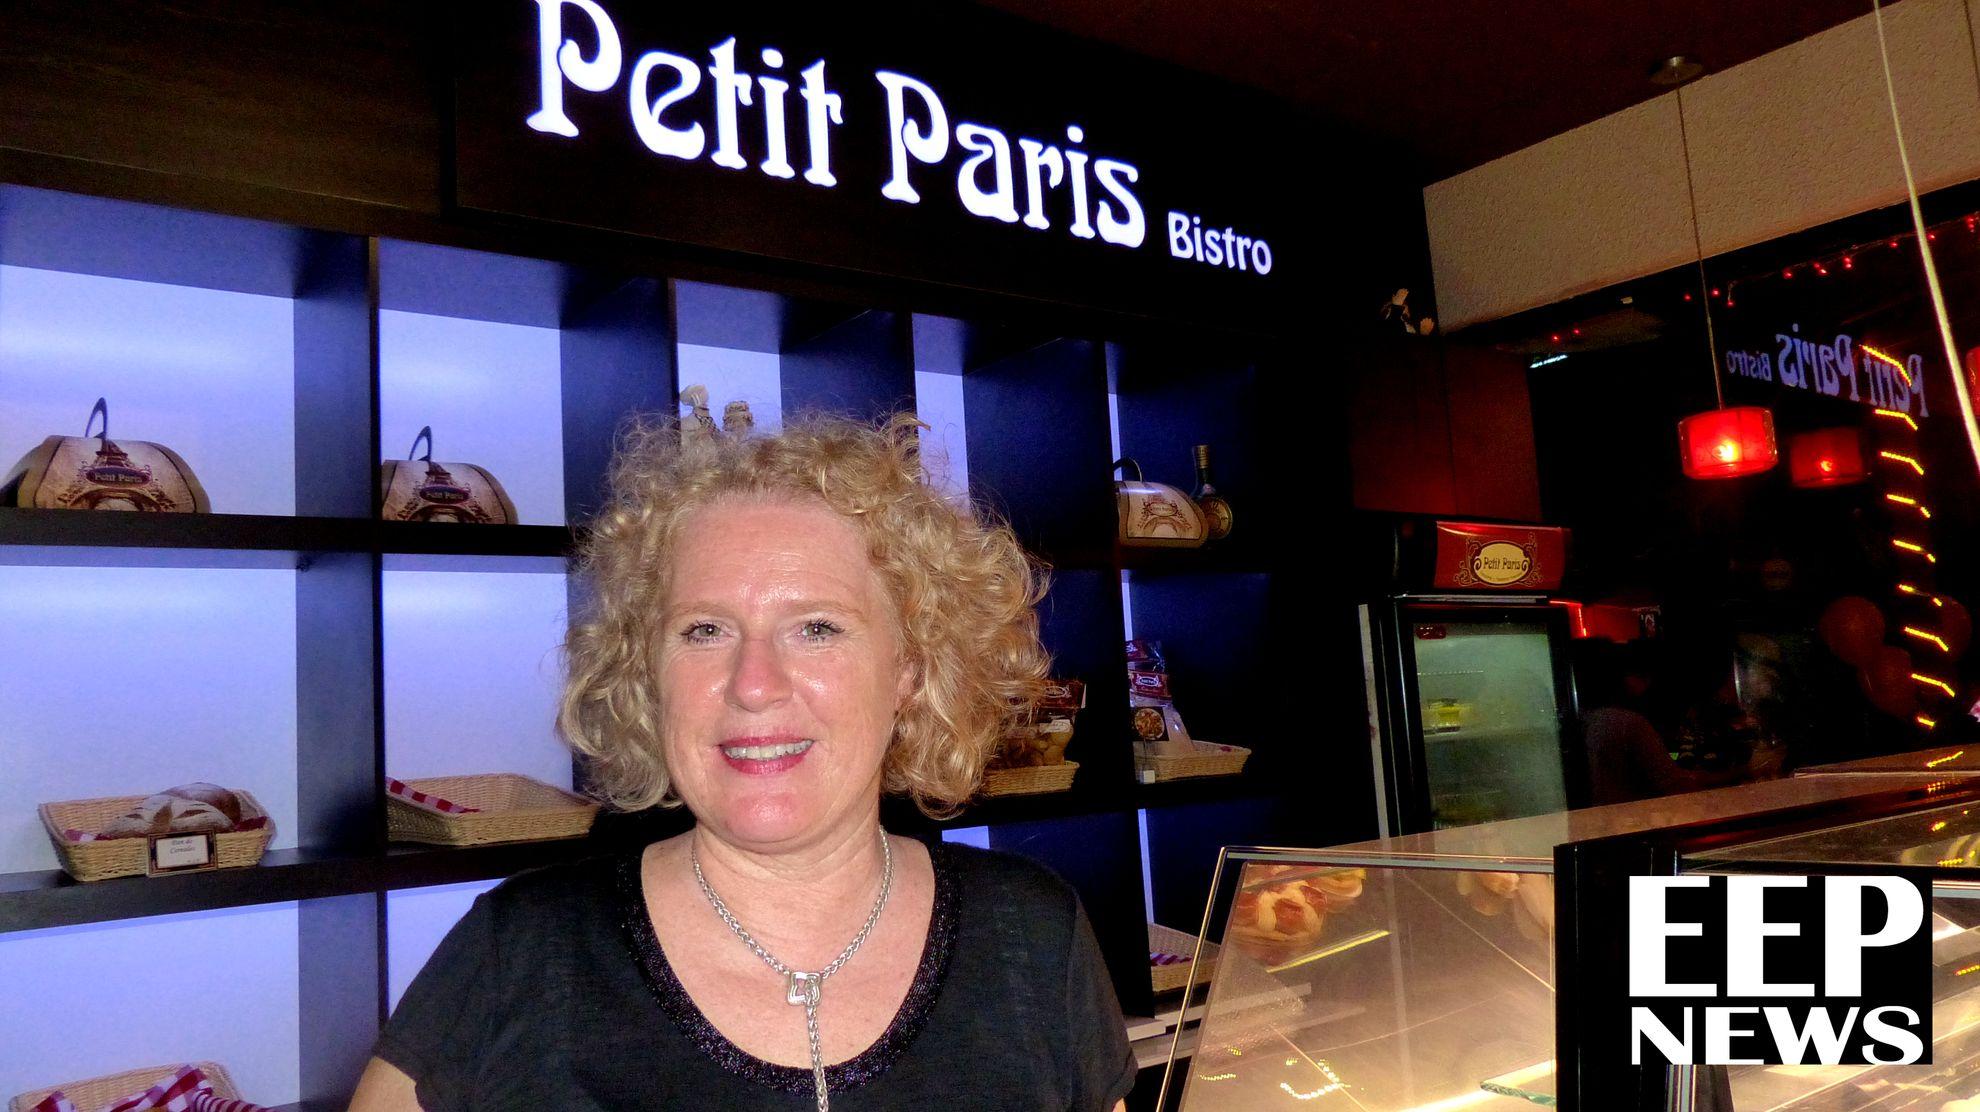 Dra. Muriel Rossignol, propietaria de Petit Paris Bistro